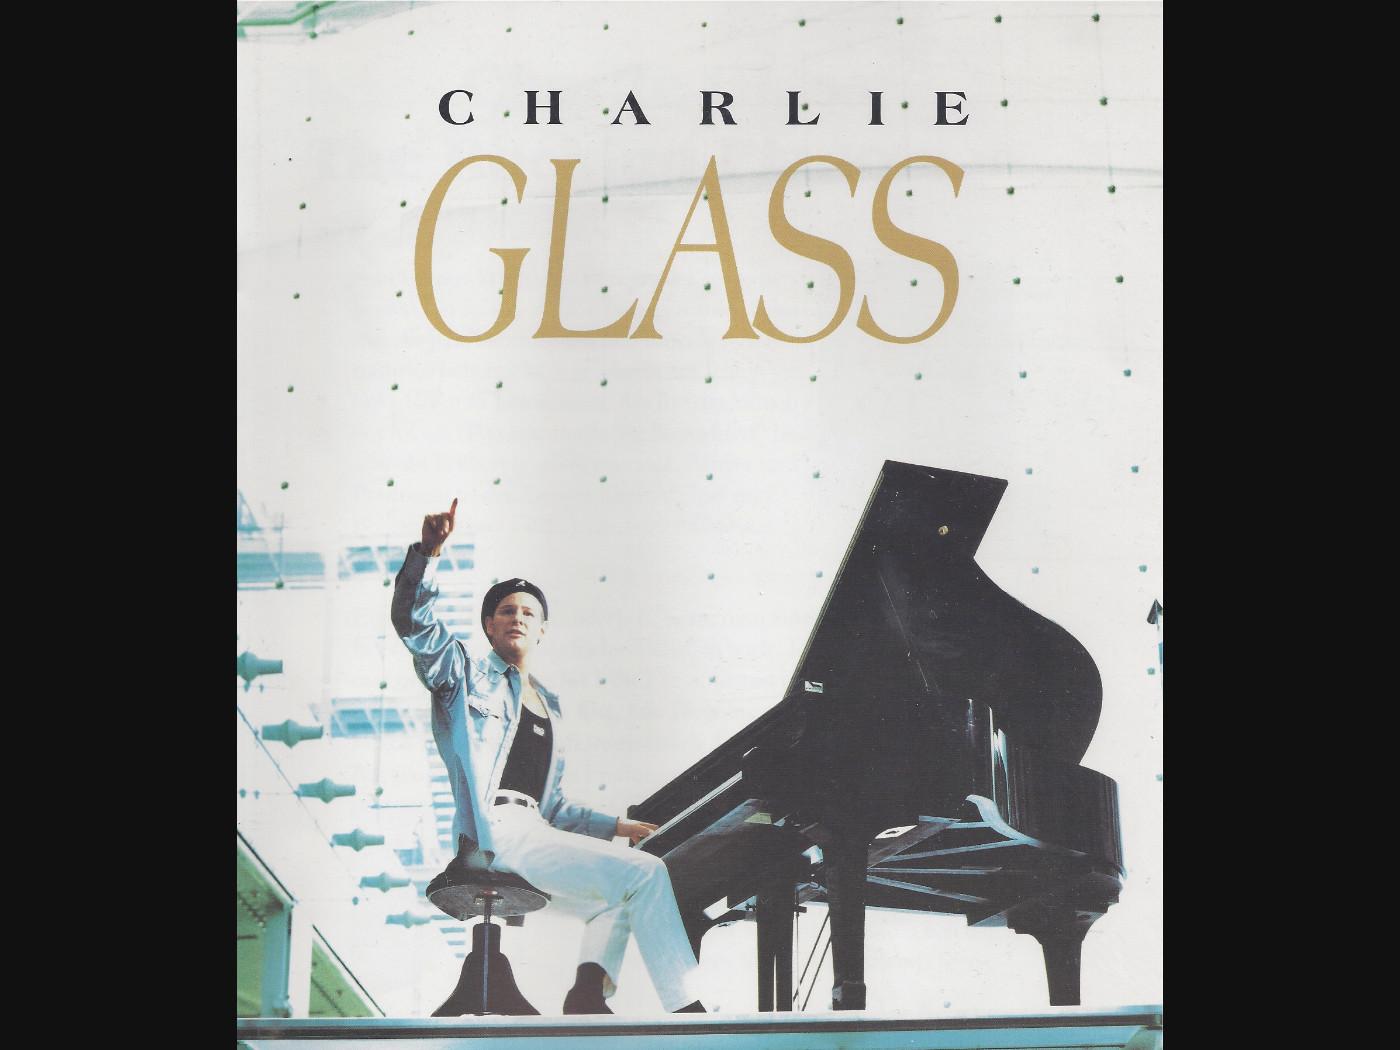 Charlie-Glass-1997.jpg